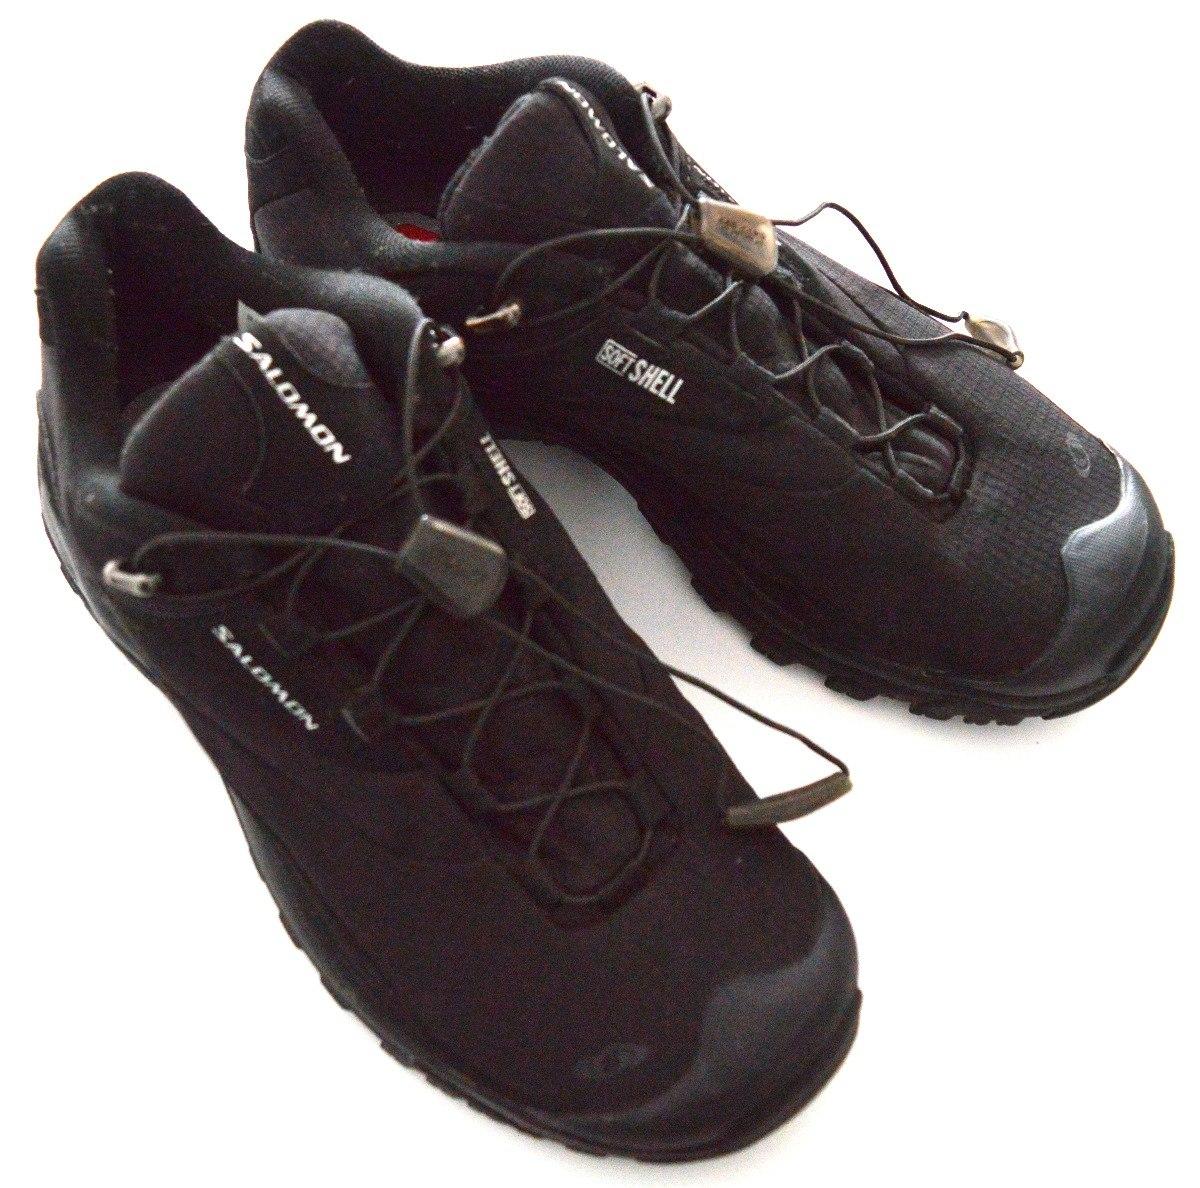 uk availability e09ad d38ee zapatillas trekking salomon - fury 3. Cargando zoom.